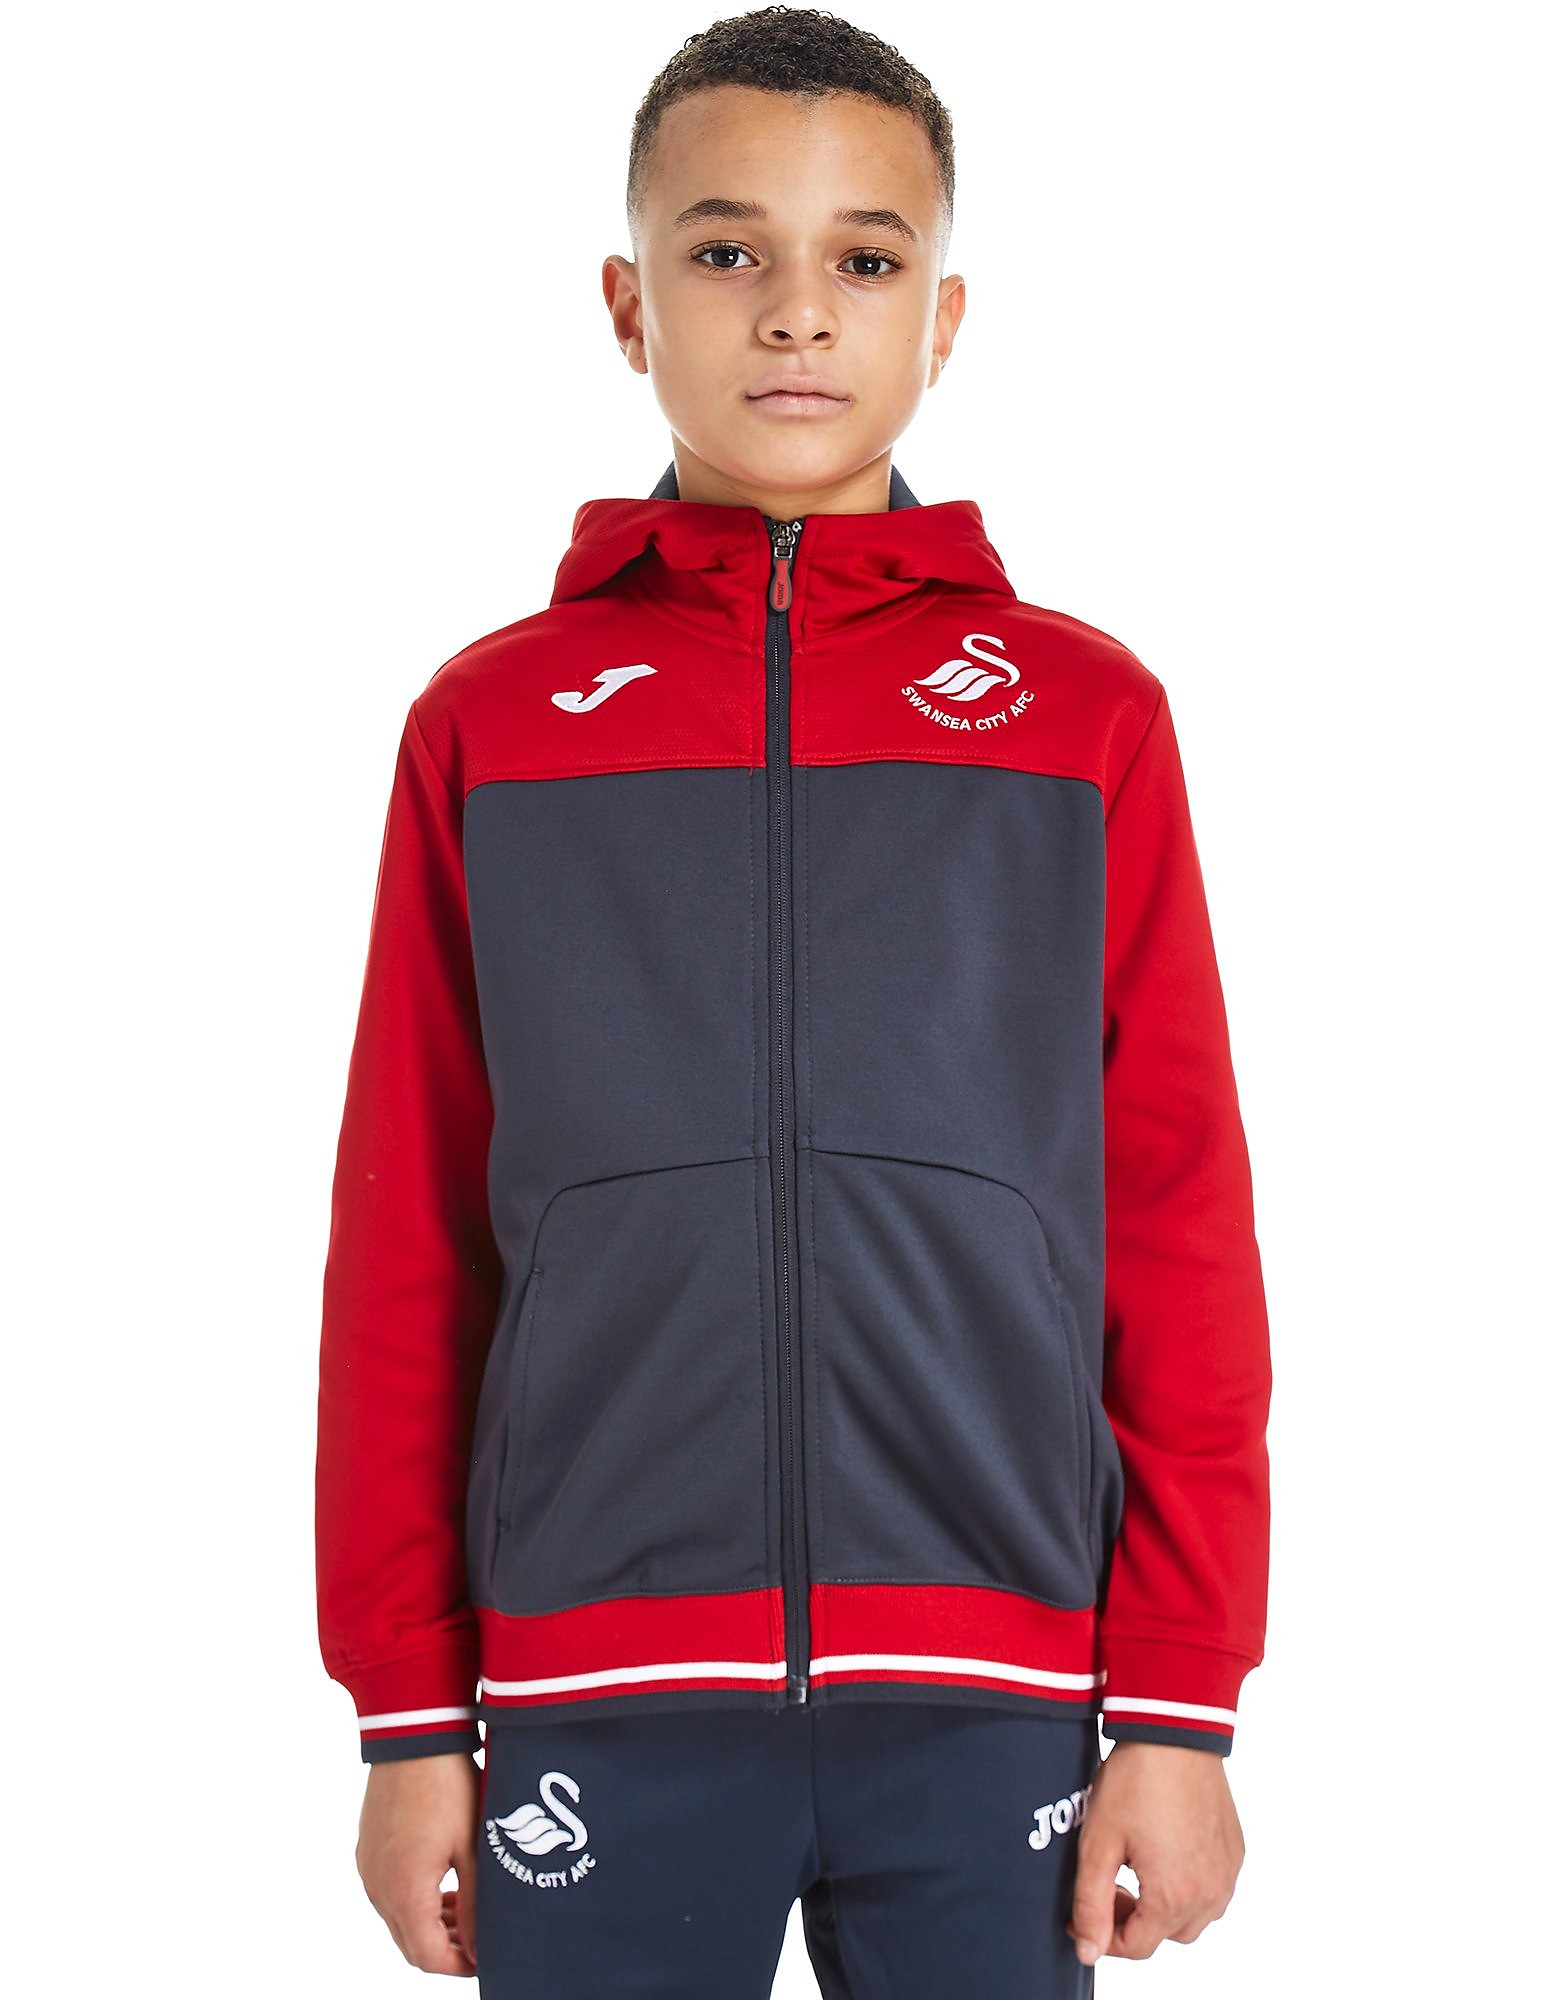 Joma Swansea City FC Training Hoodie Junior